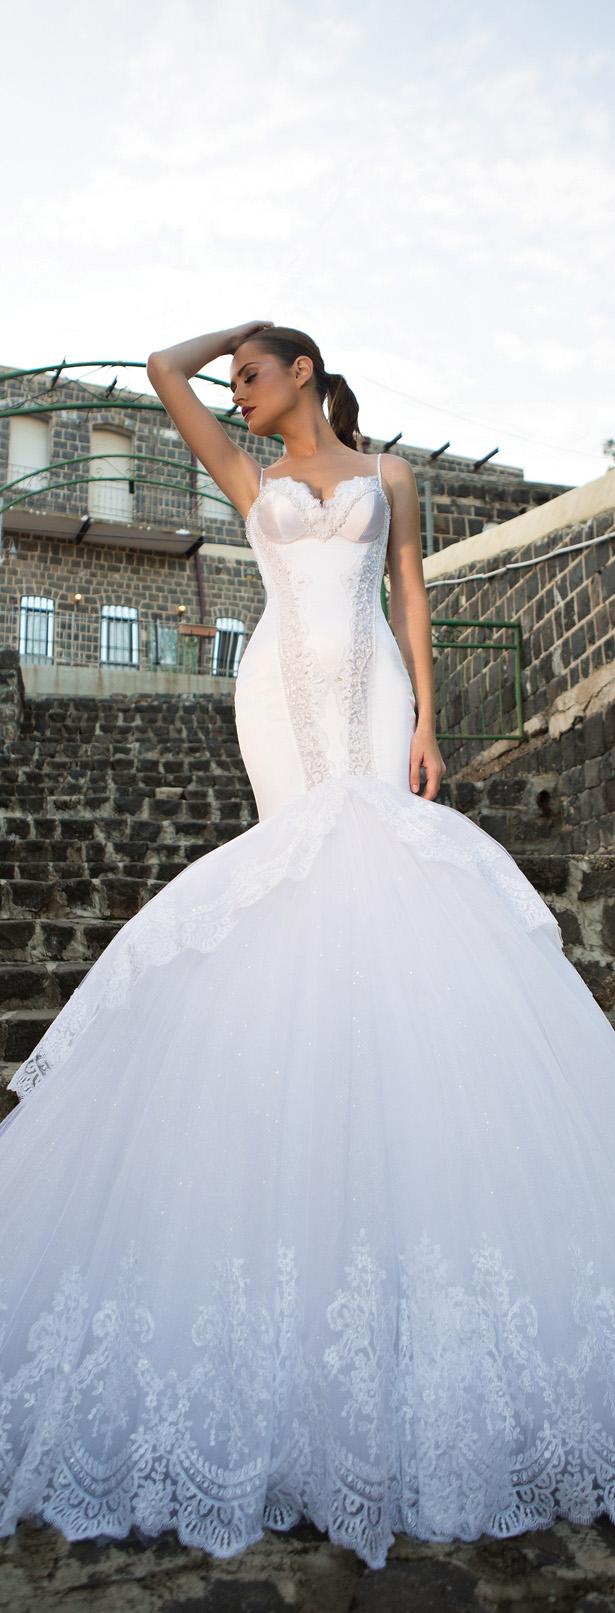 shabiisrael-2015-wedding-dresses-75